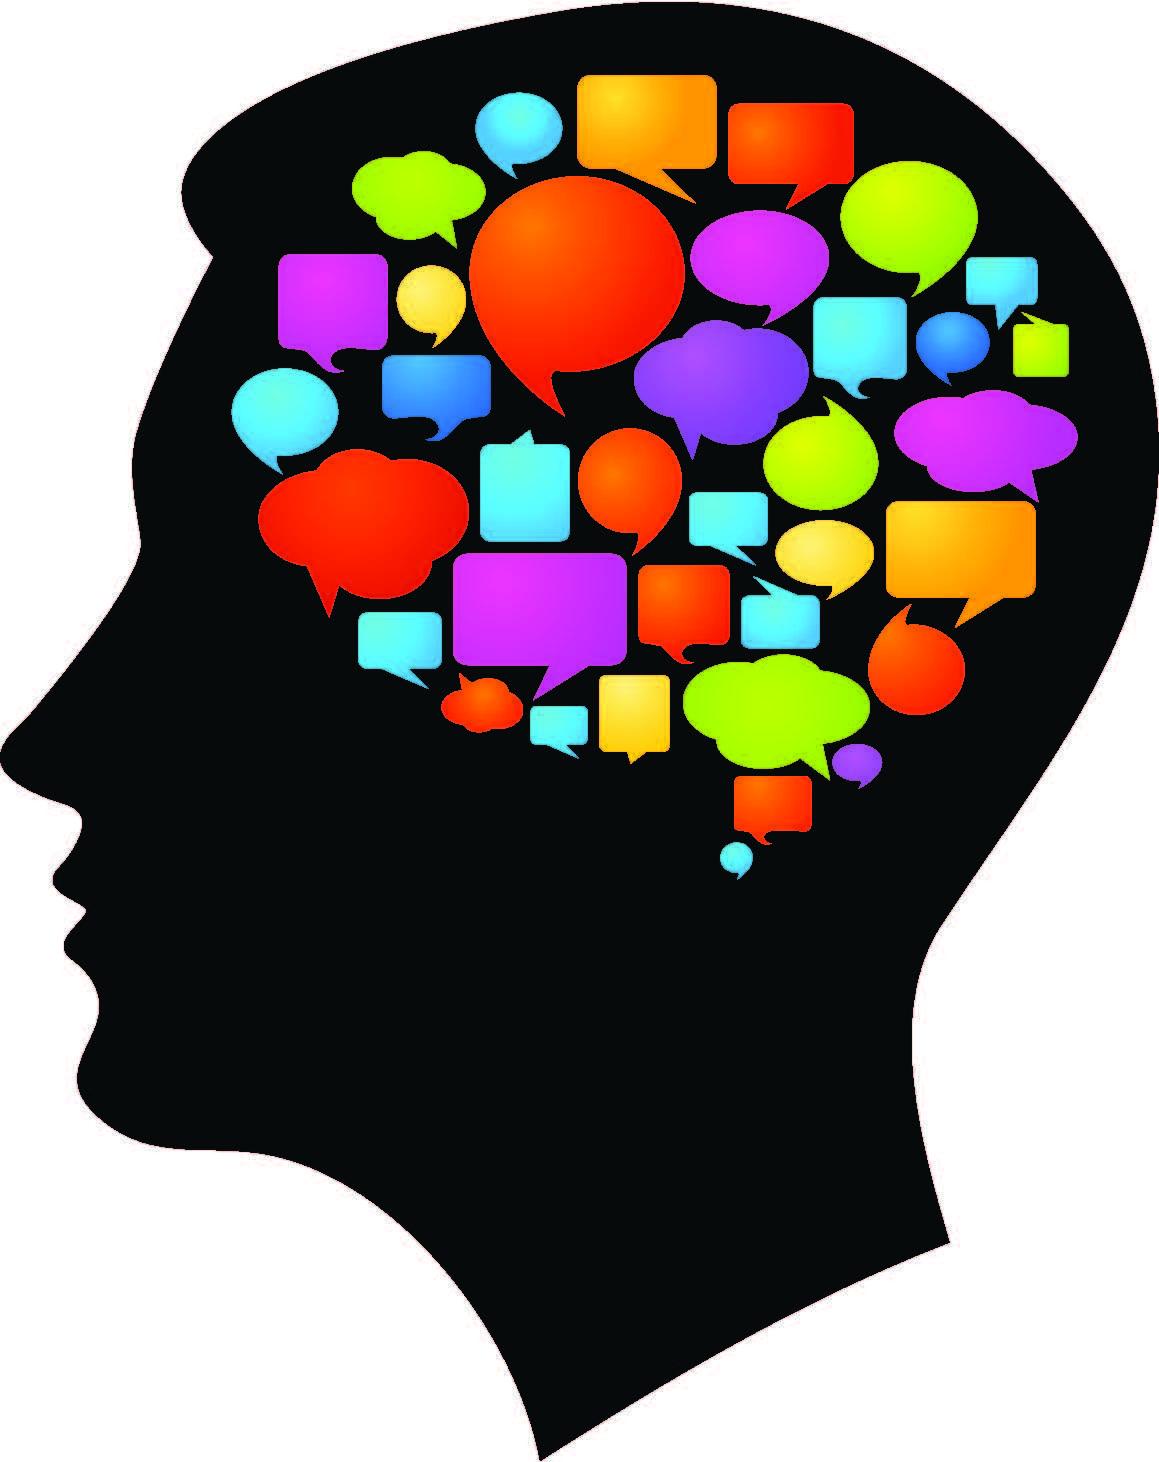 Imagen de un cerebro moderno MULTITASKING away ...todo el dia